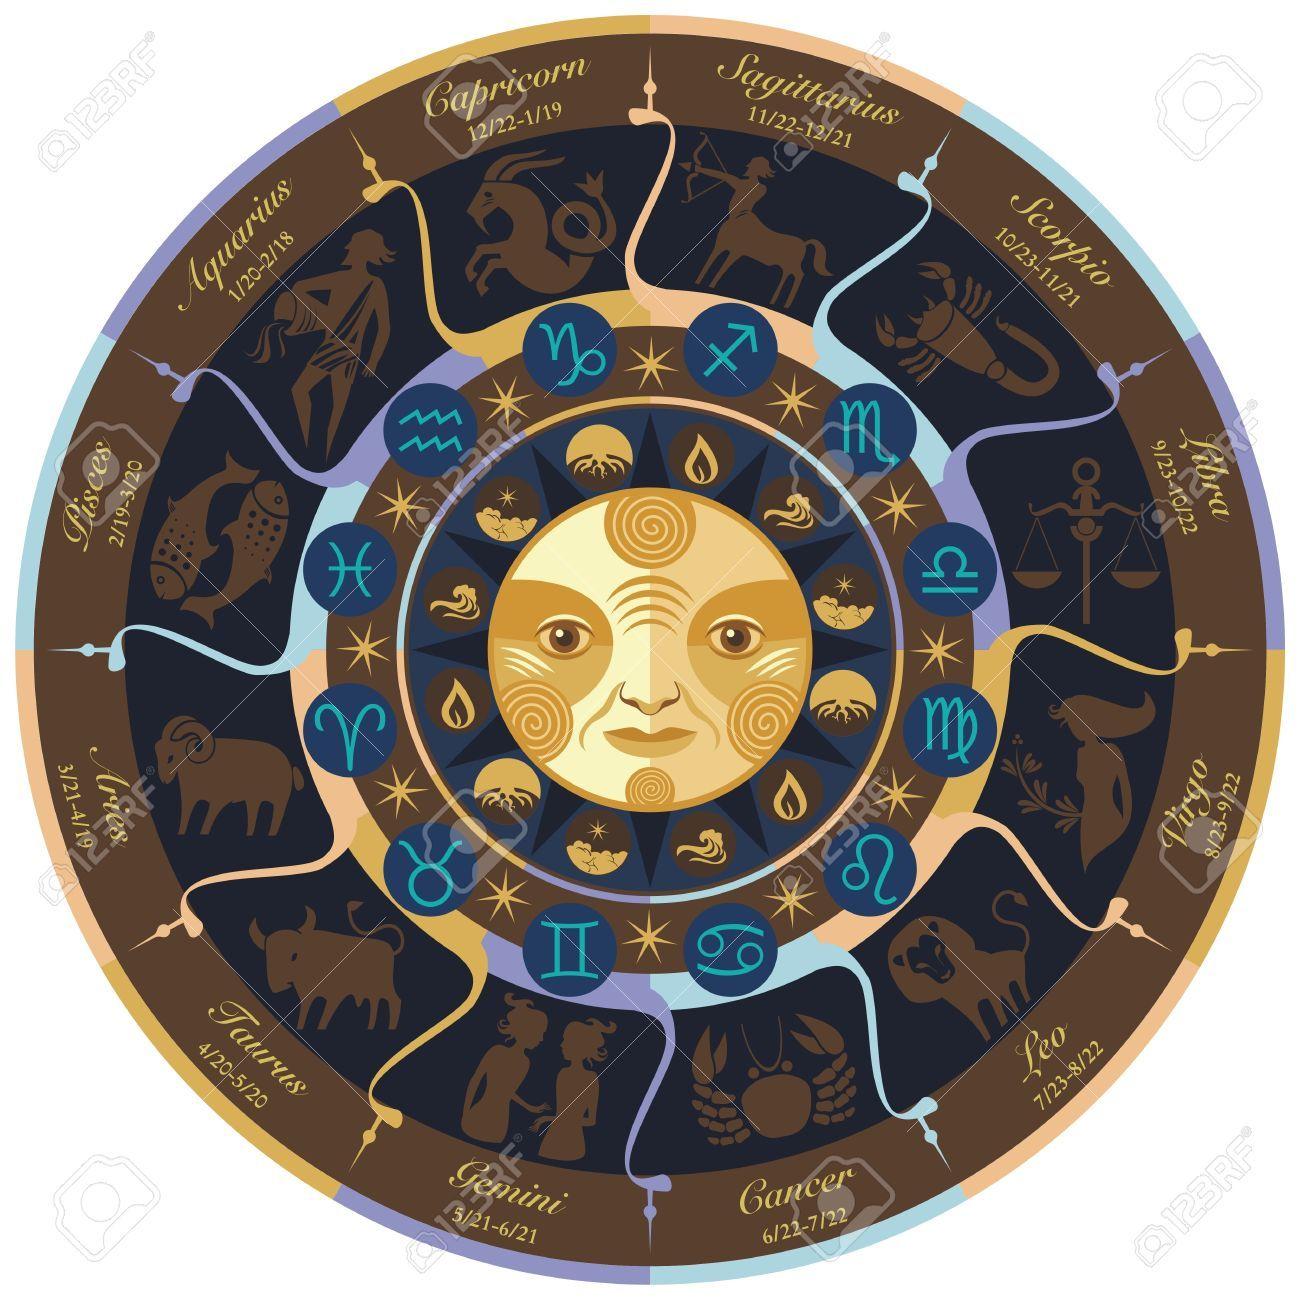 roue-thème-astral-.jpg